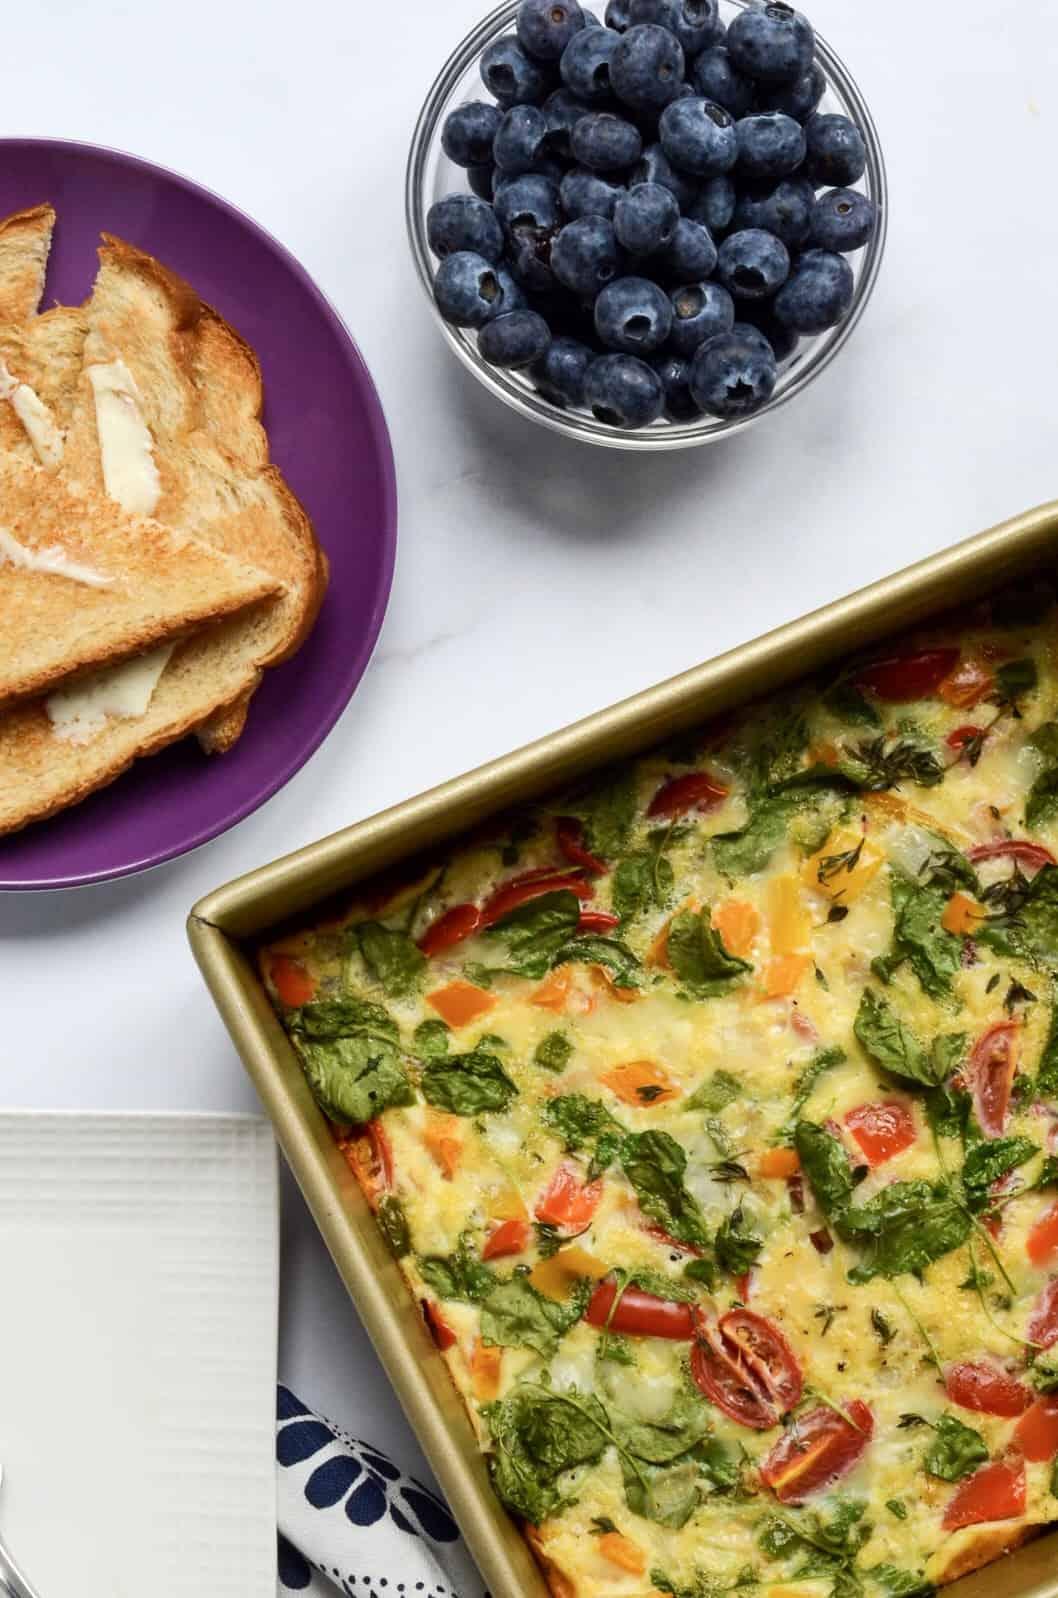 healthy egg and vegetable bake